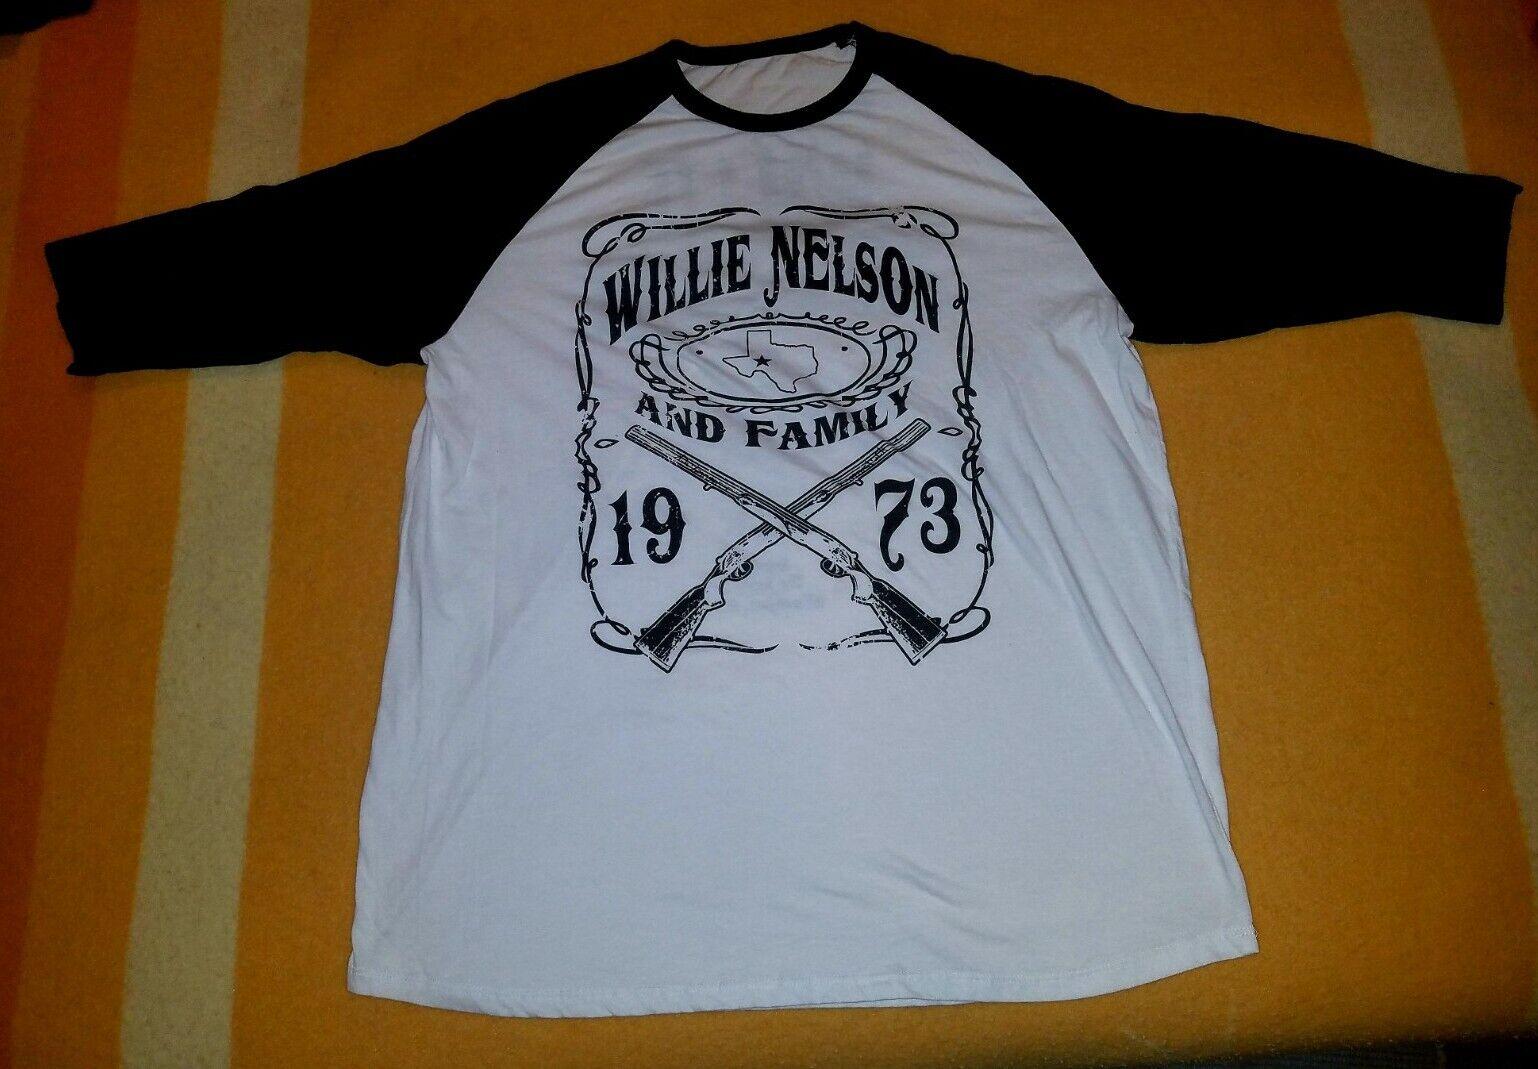 VTG Shotgun Willie Nelson and Family Tour 3/4 Length Large T-shirt 1973, CA & NC